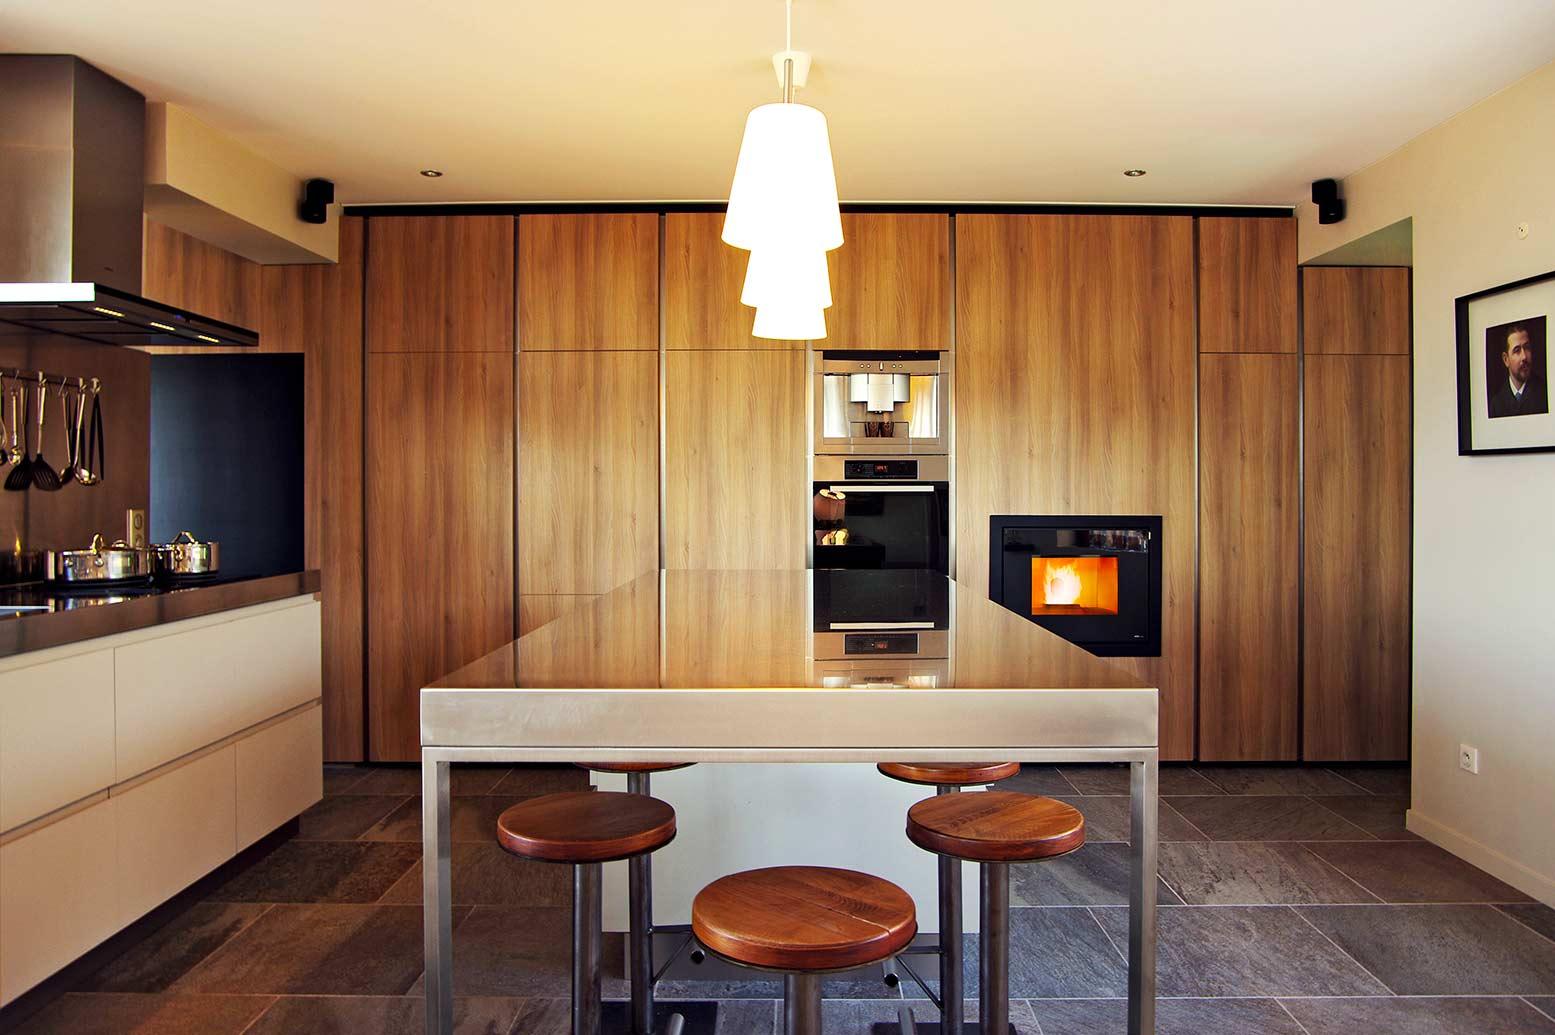 vivo 80 caminetto a pellet mcz. Black Bedroom Furniture Sets. Home Design Ideas